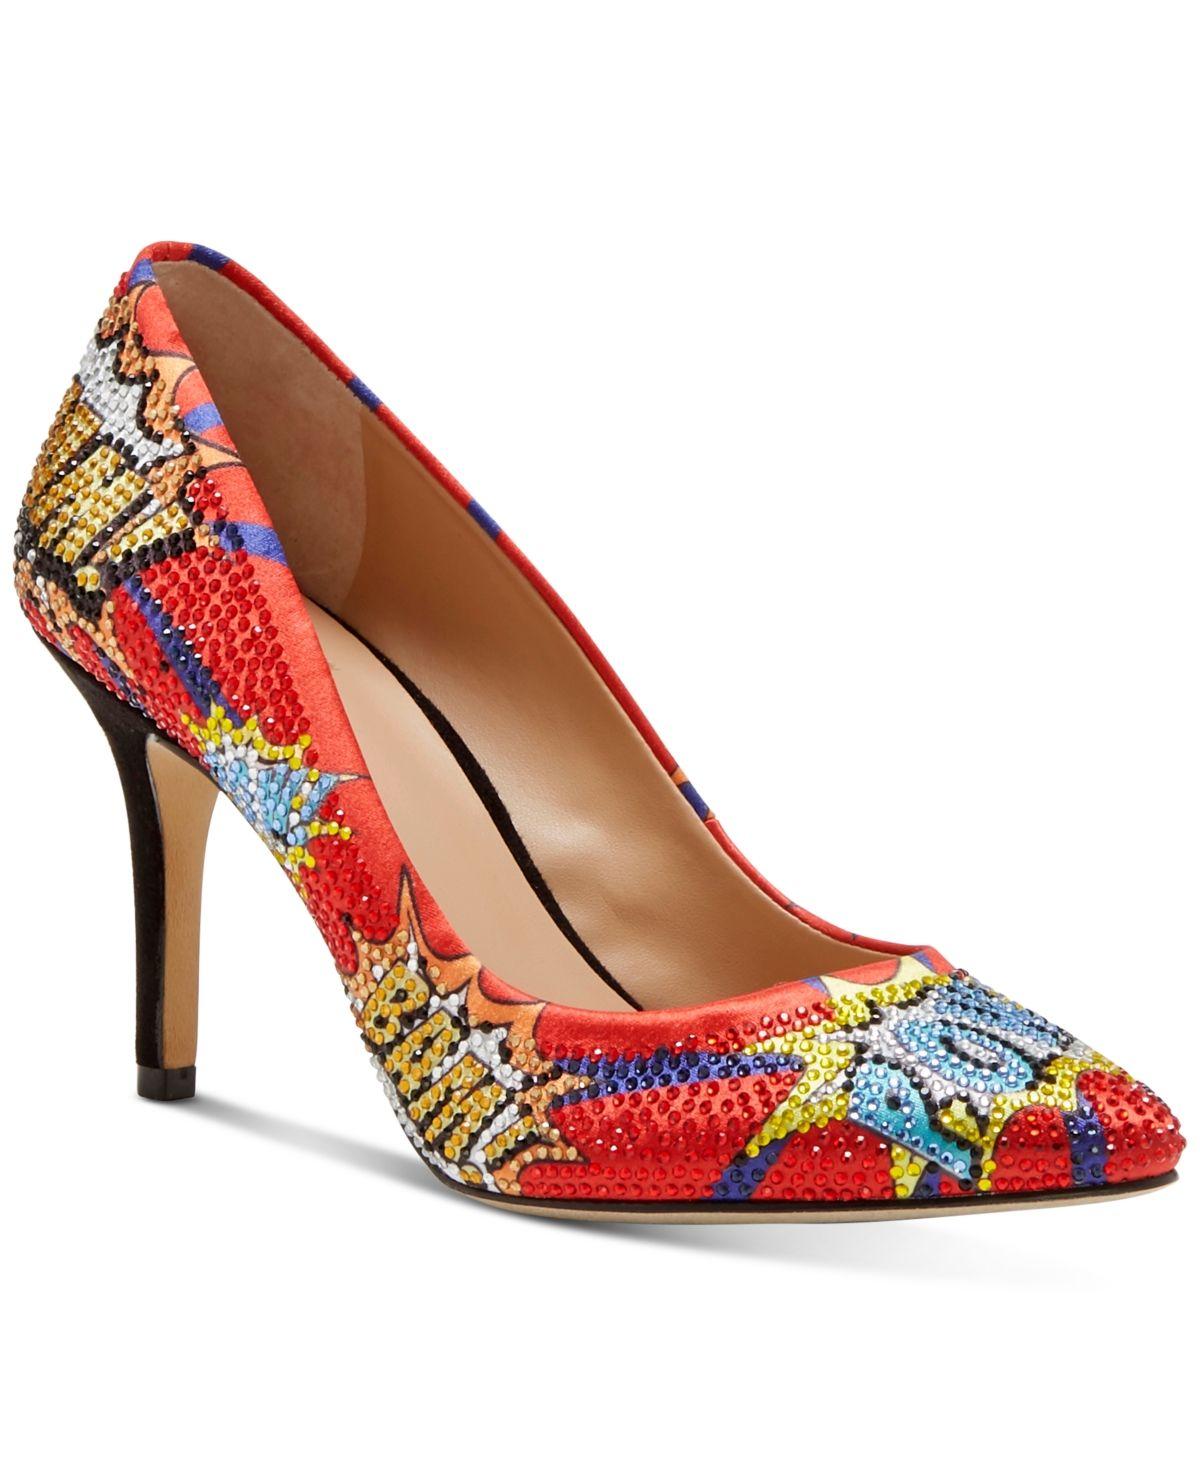 Inc Women's Zitah Pointed Toe Pumps